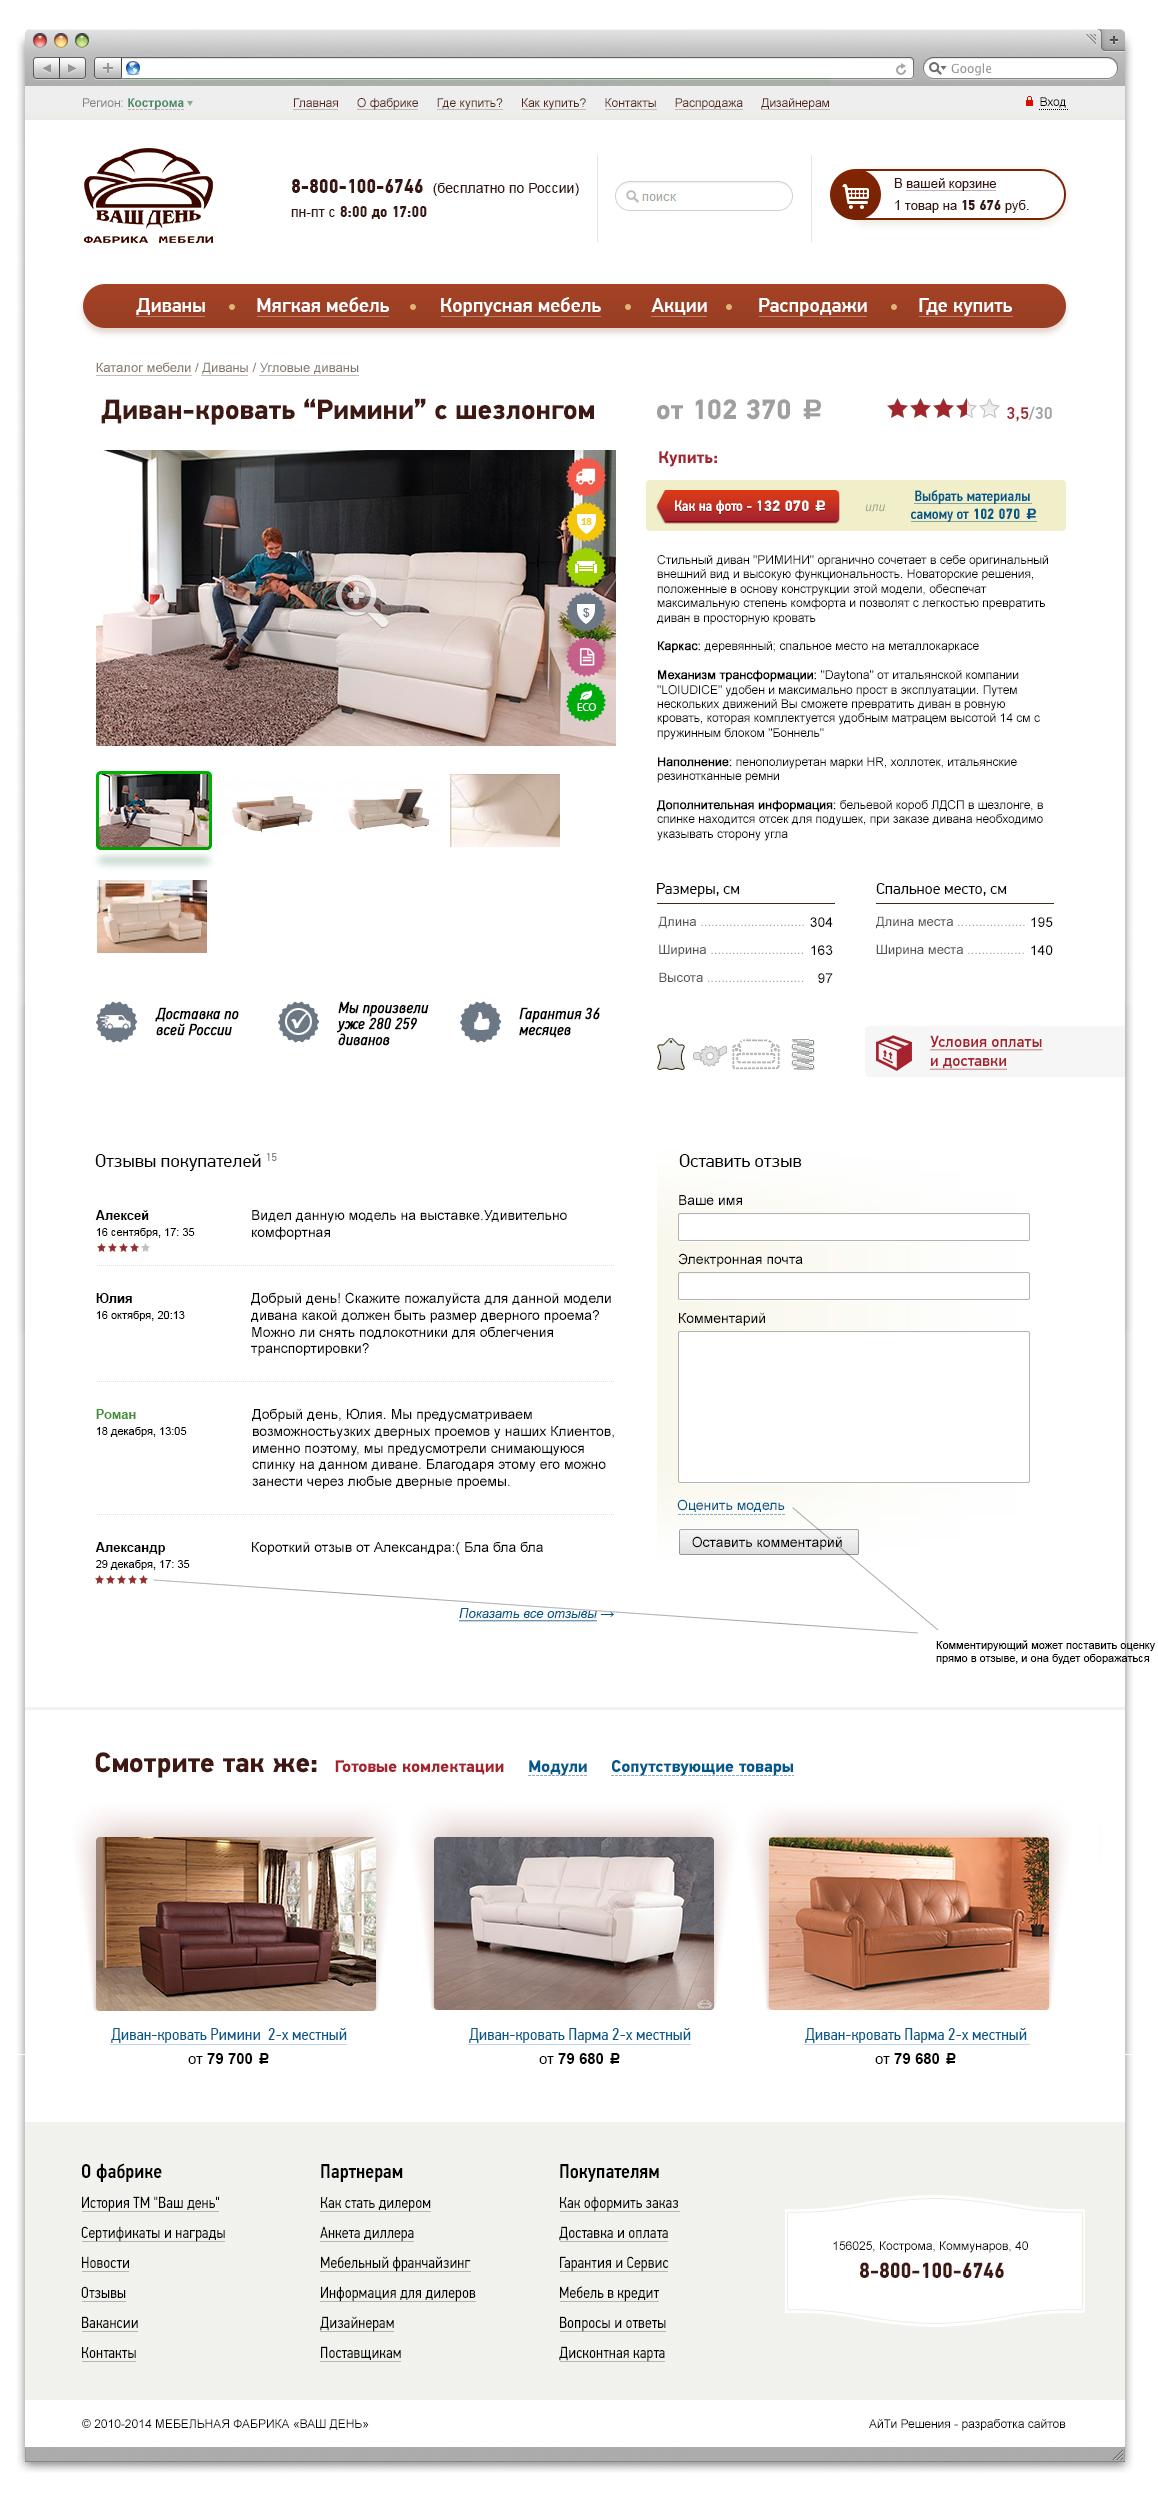 Разработать дизайн для интернет-магазина мебели фото f_93952f25bcd1f062.jpg